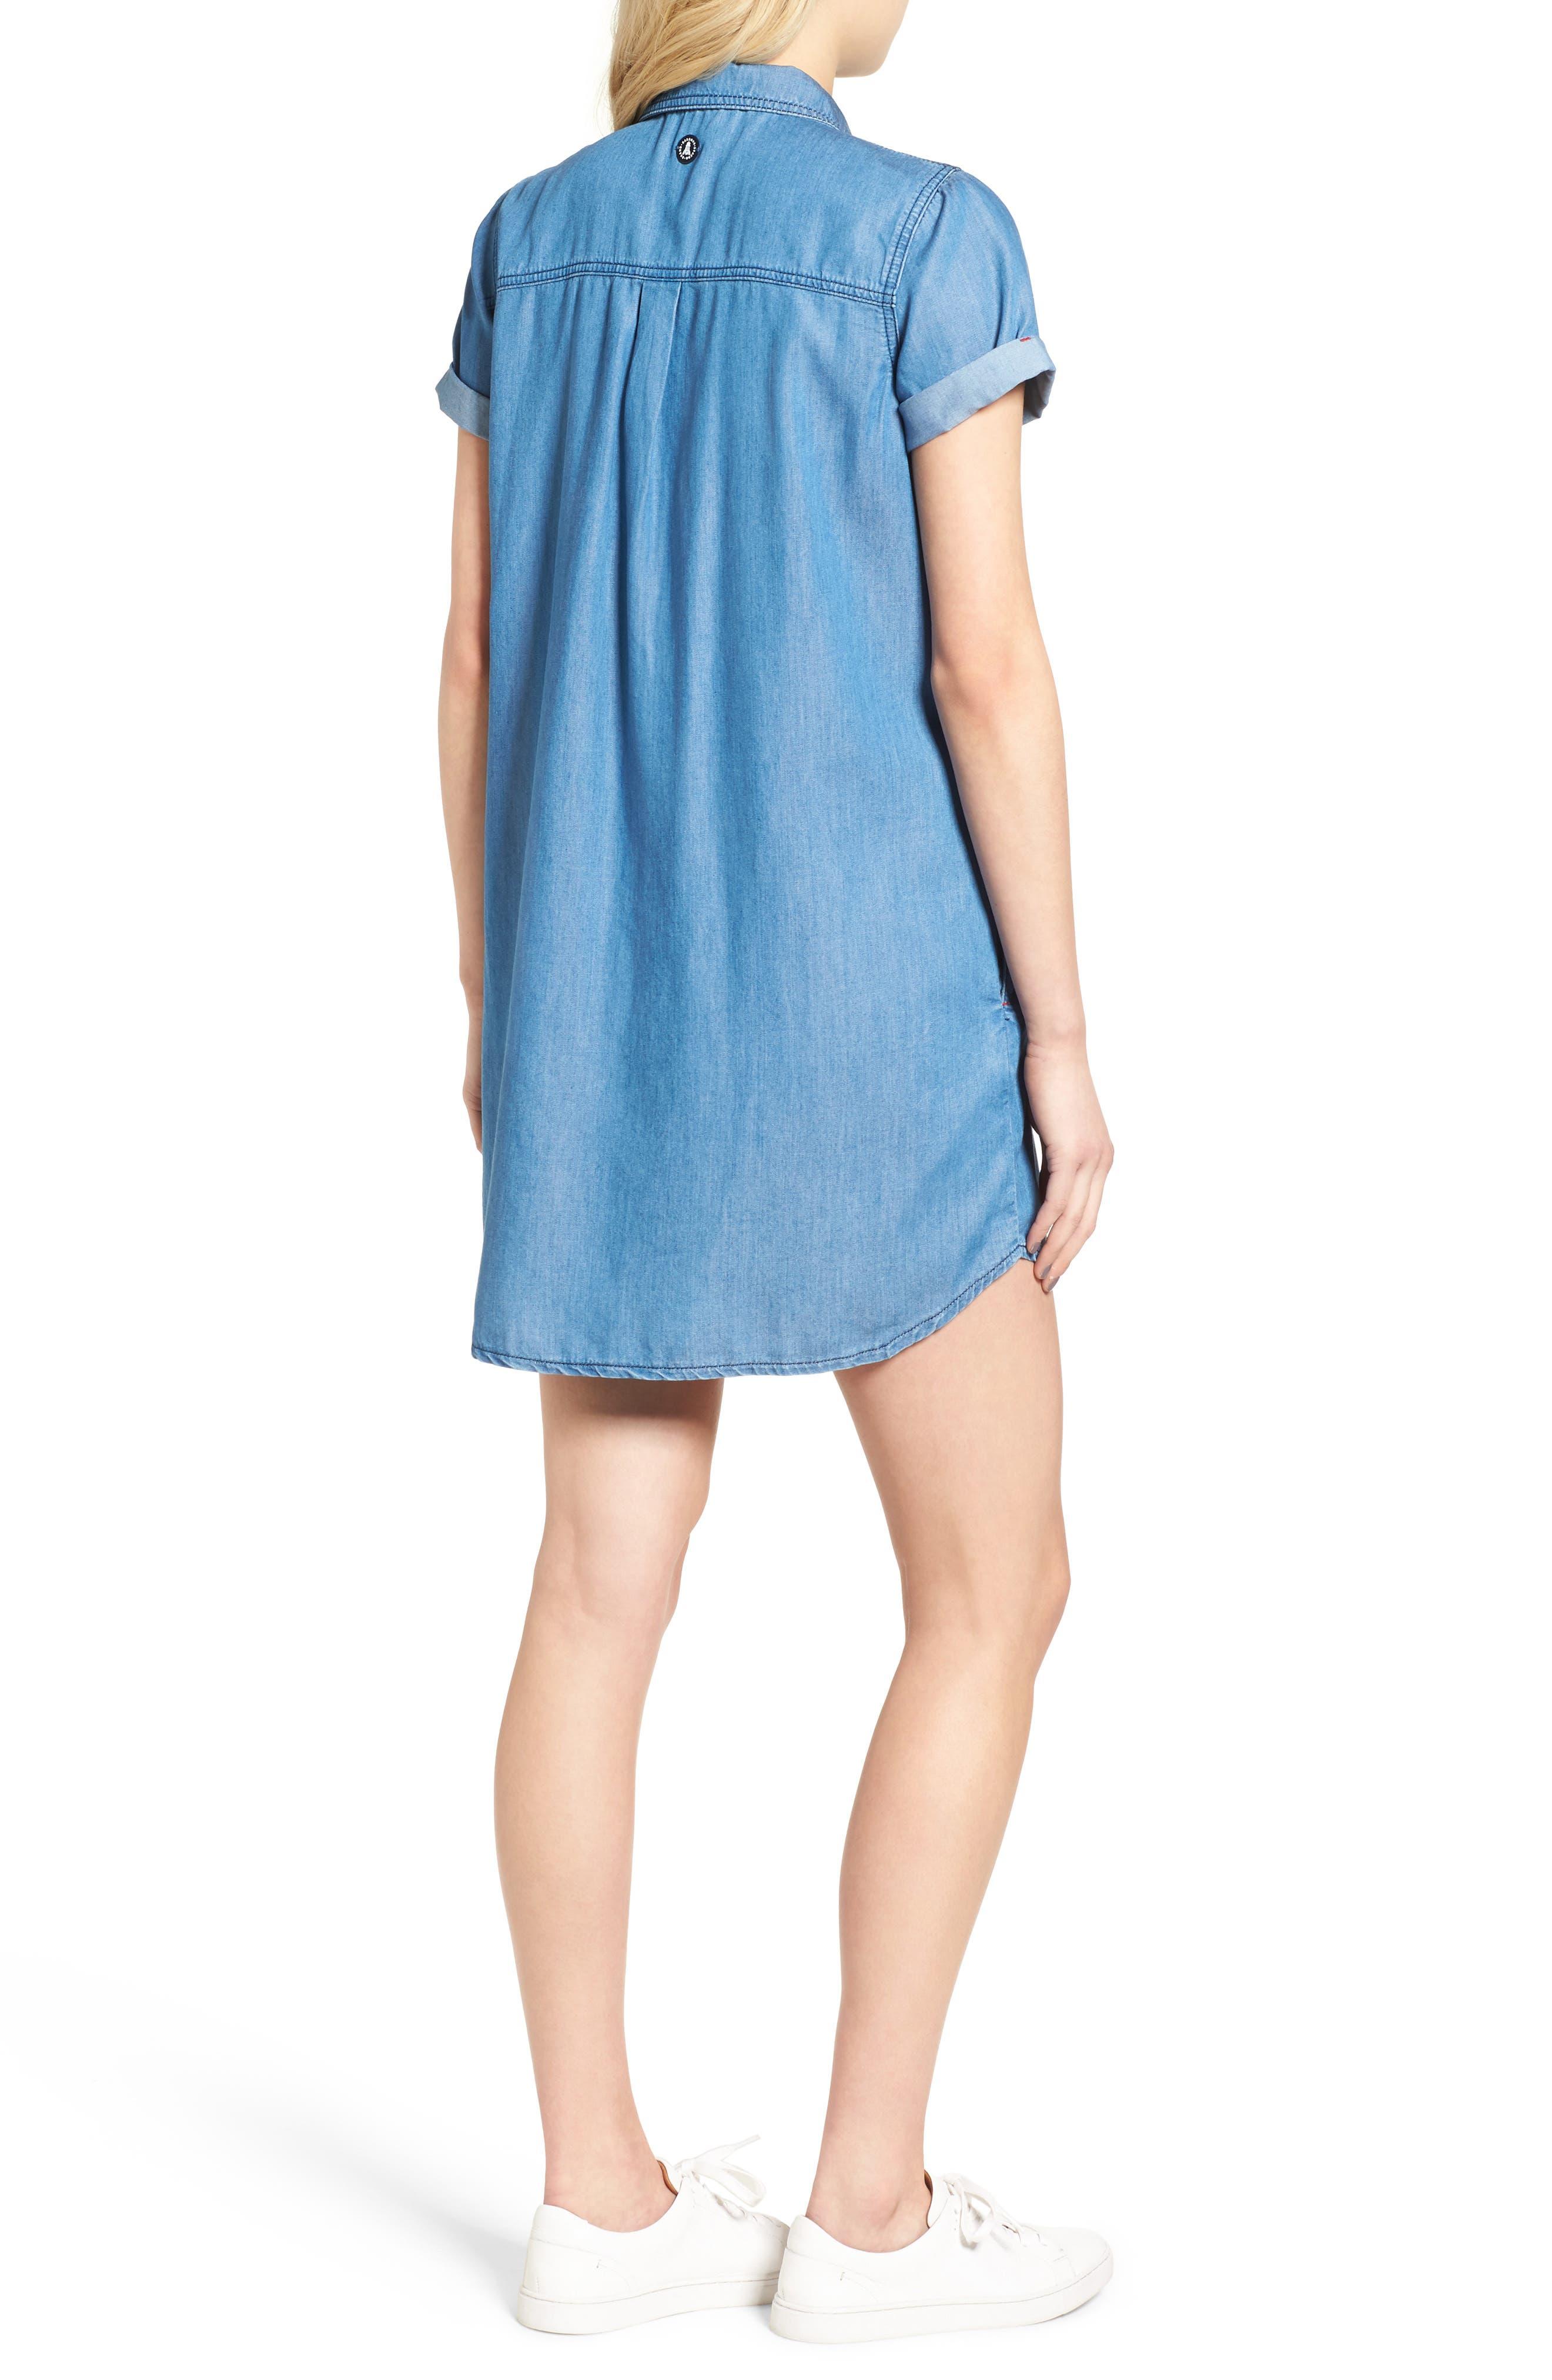 Fins Chambray Shirtdress,                             Alternate thumbnail 2, color,                             450